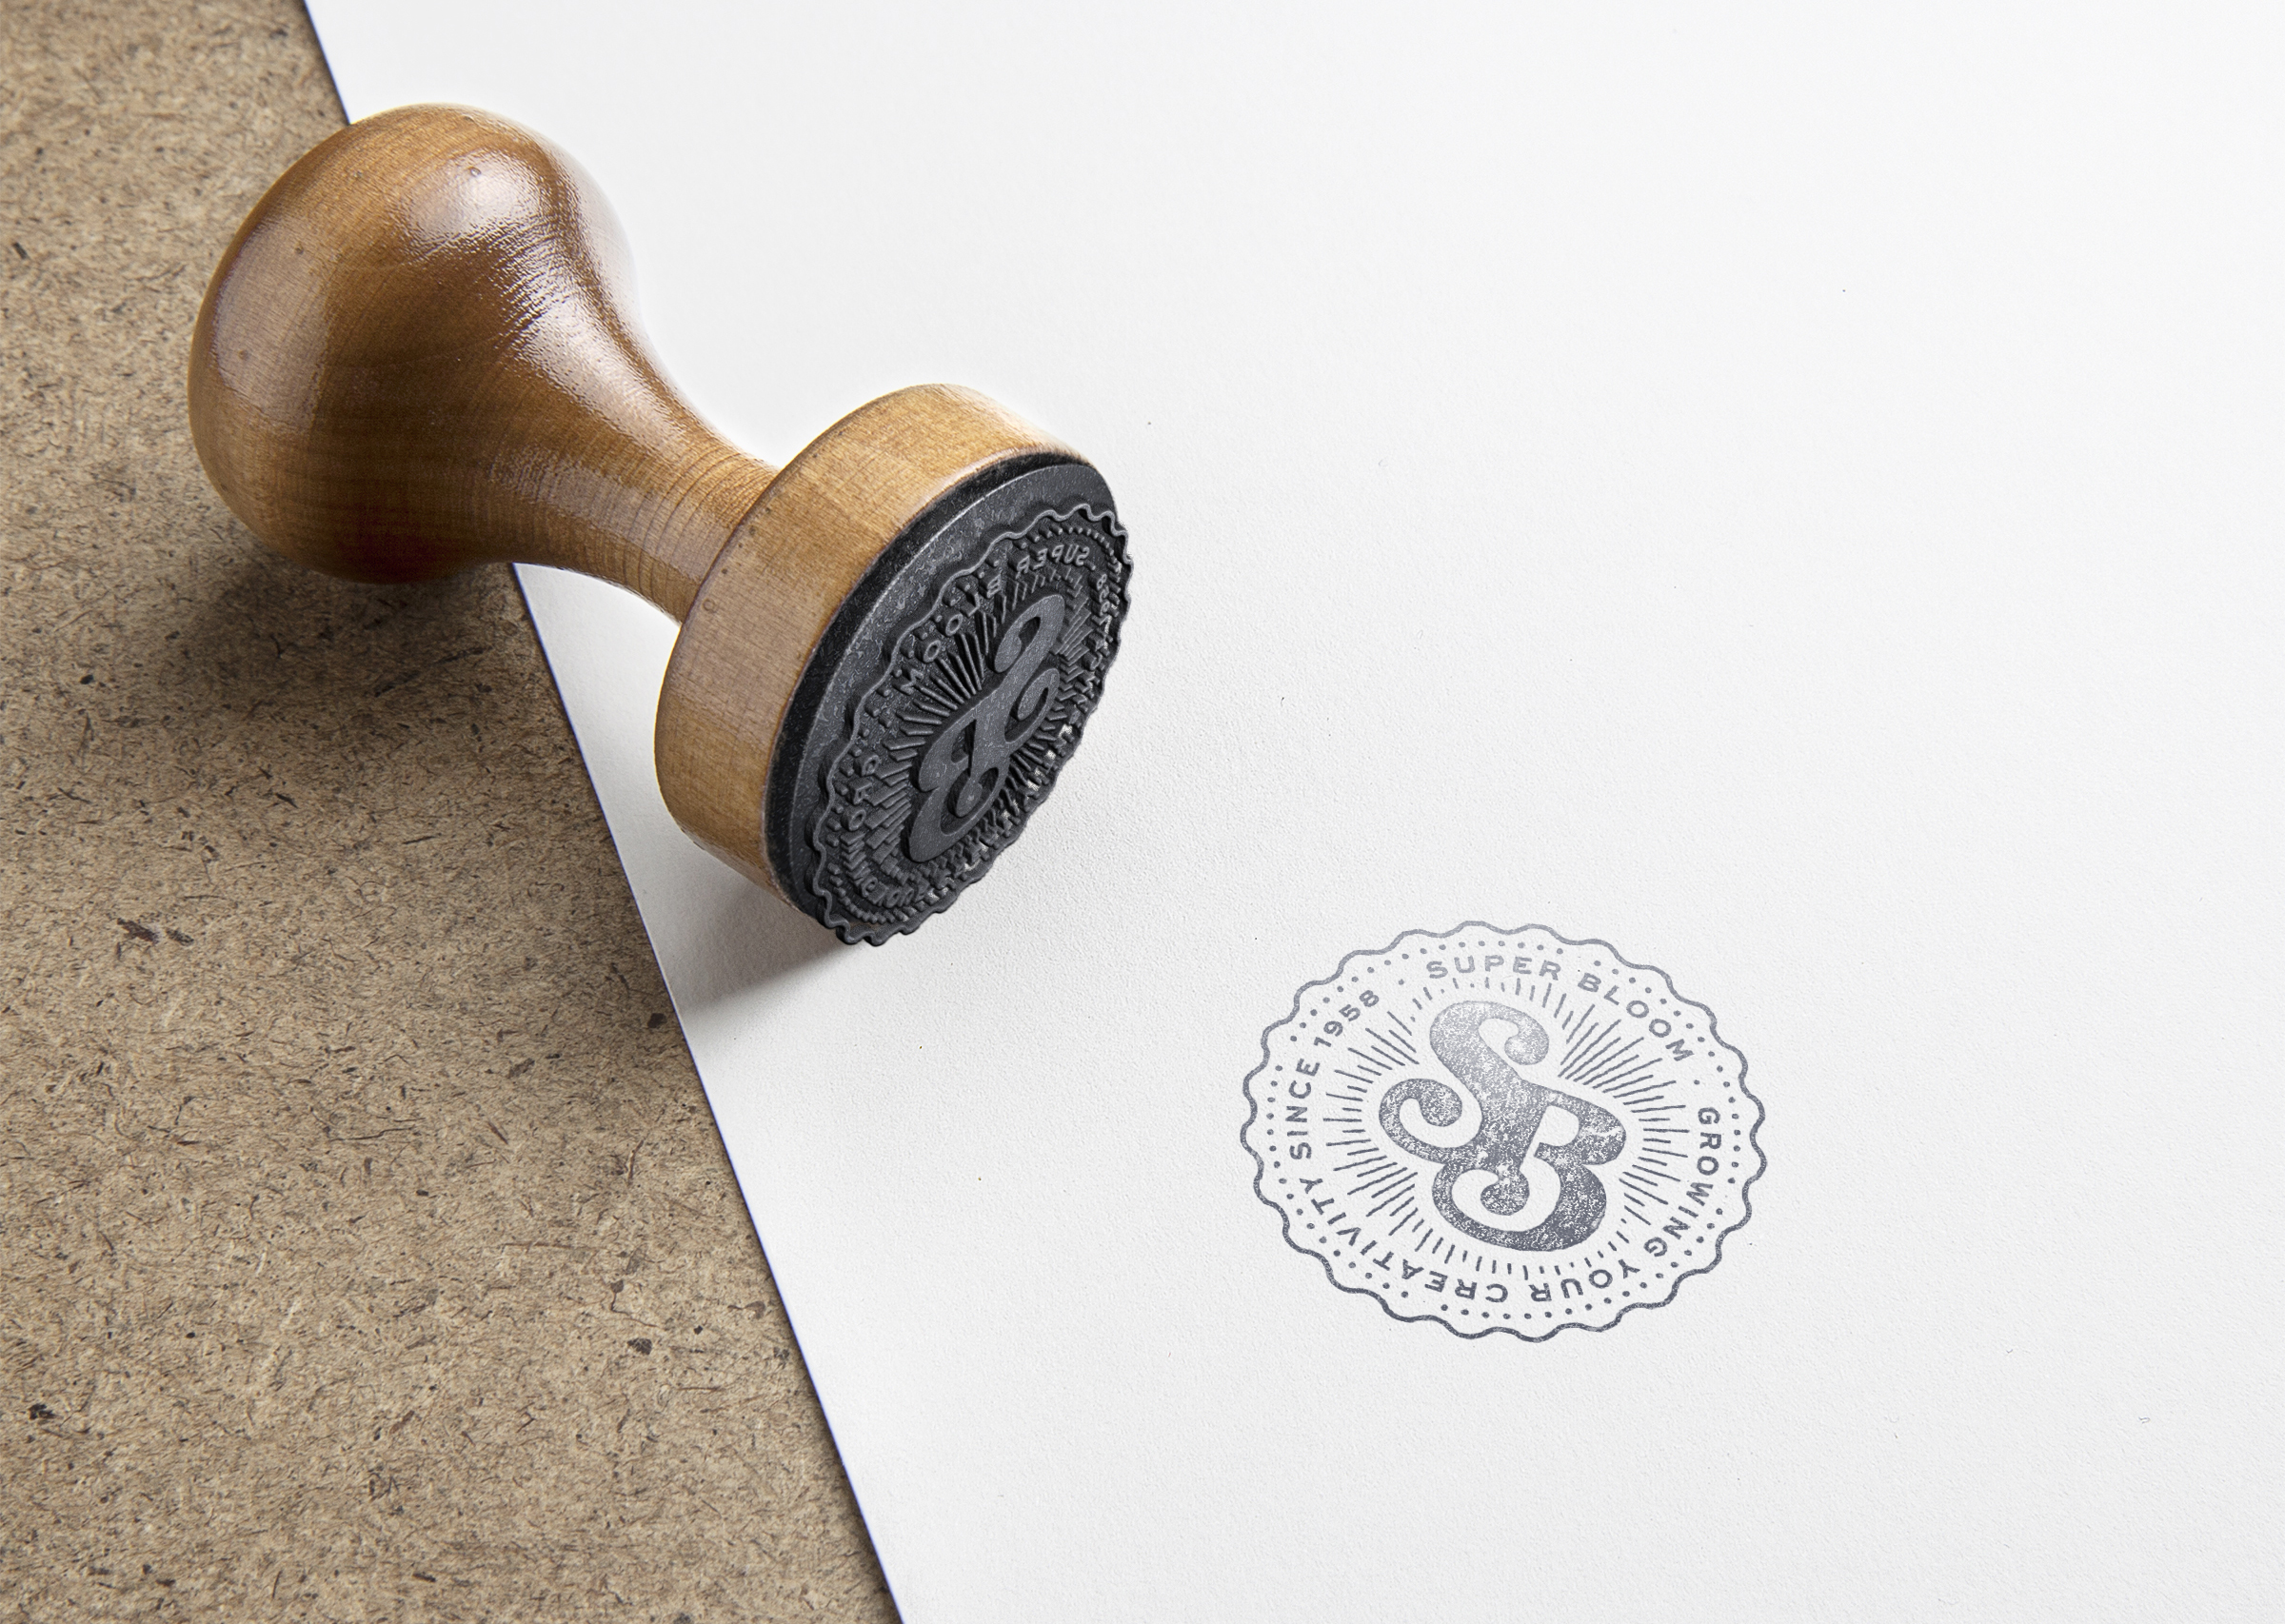 SB_Stamp.jpg